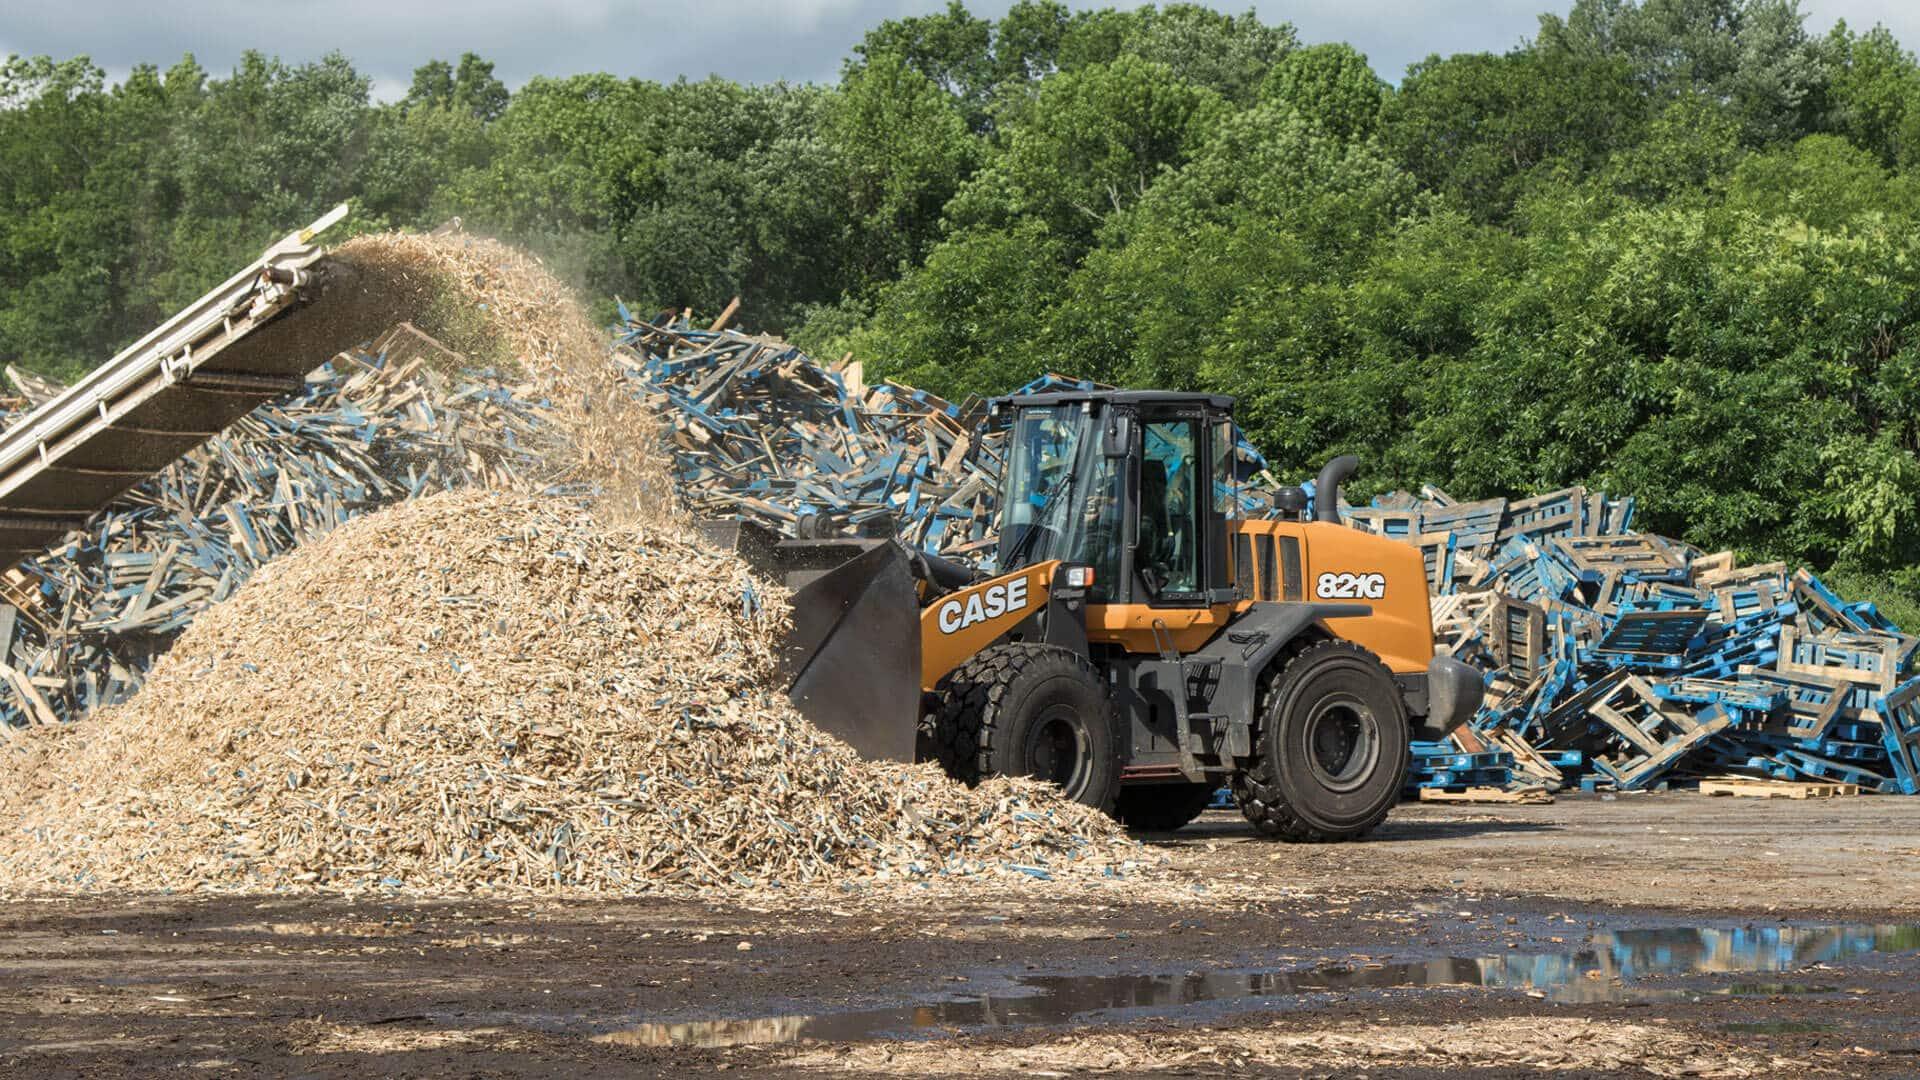 CASE 821G Wheel Loader | CASE Construction Equipment